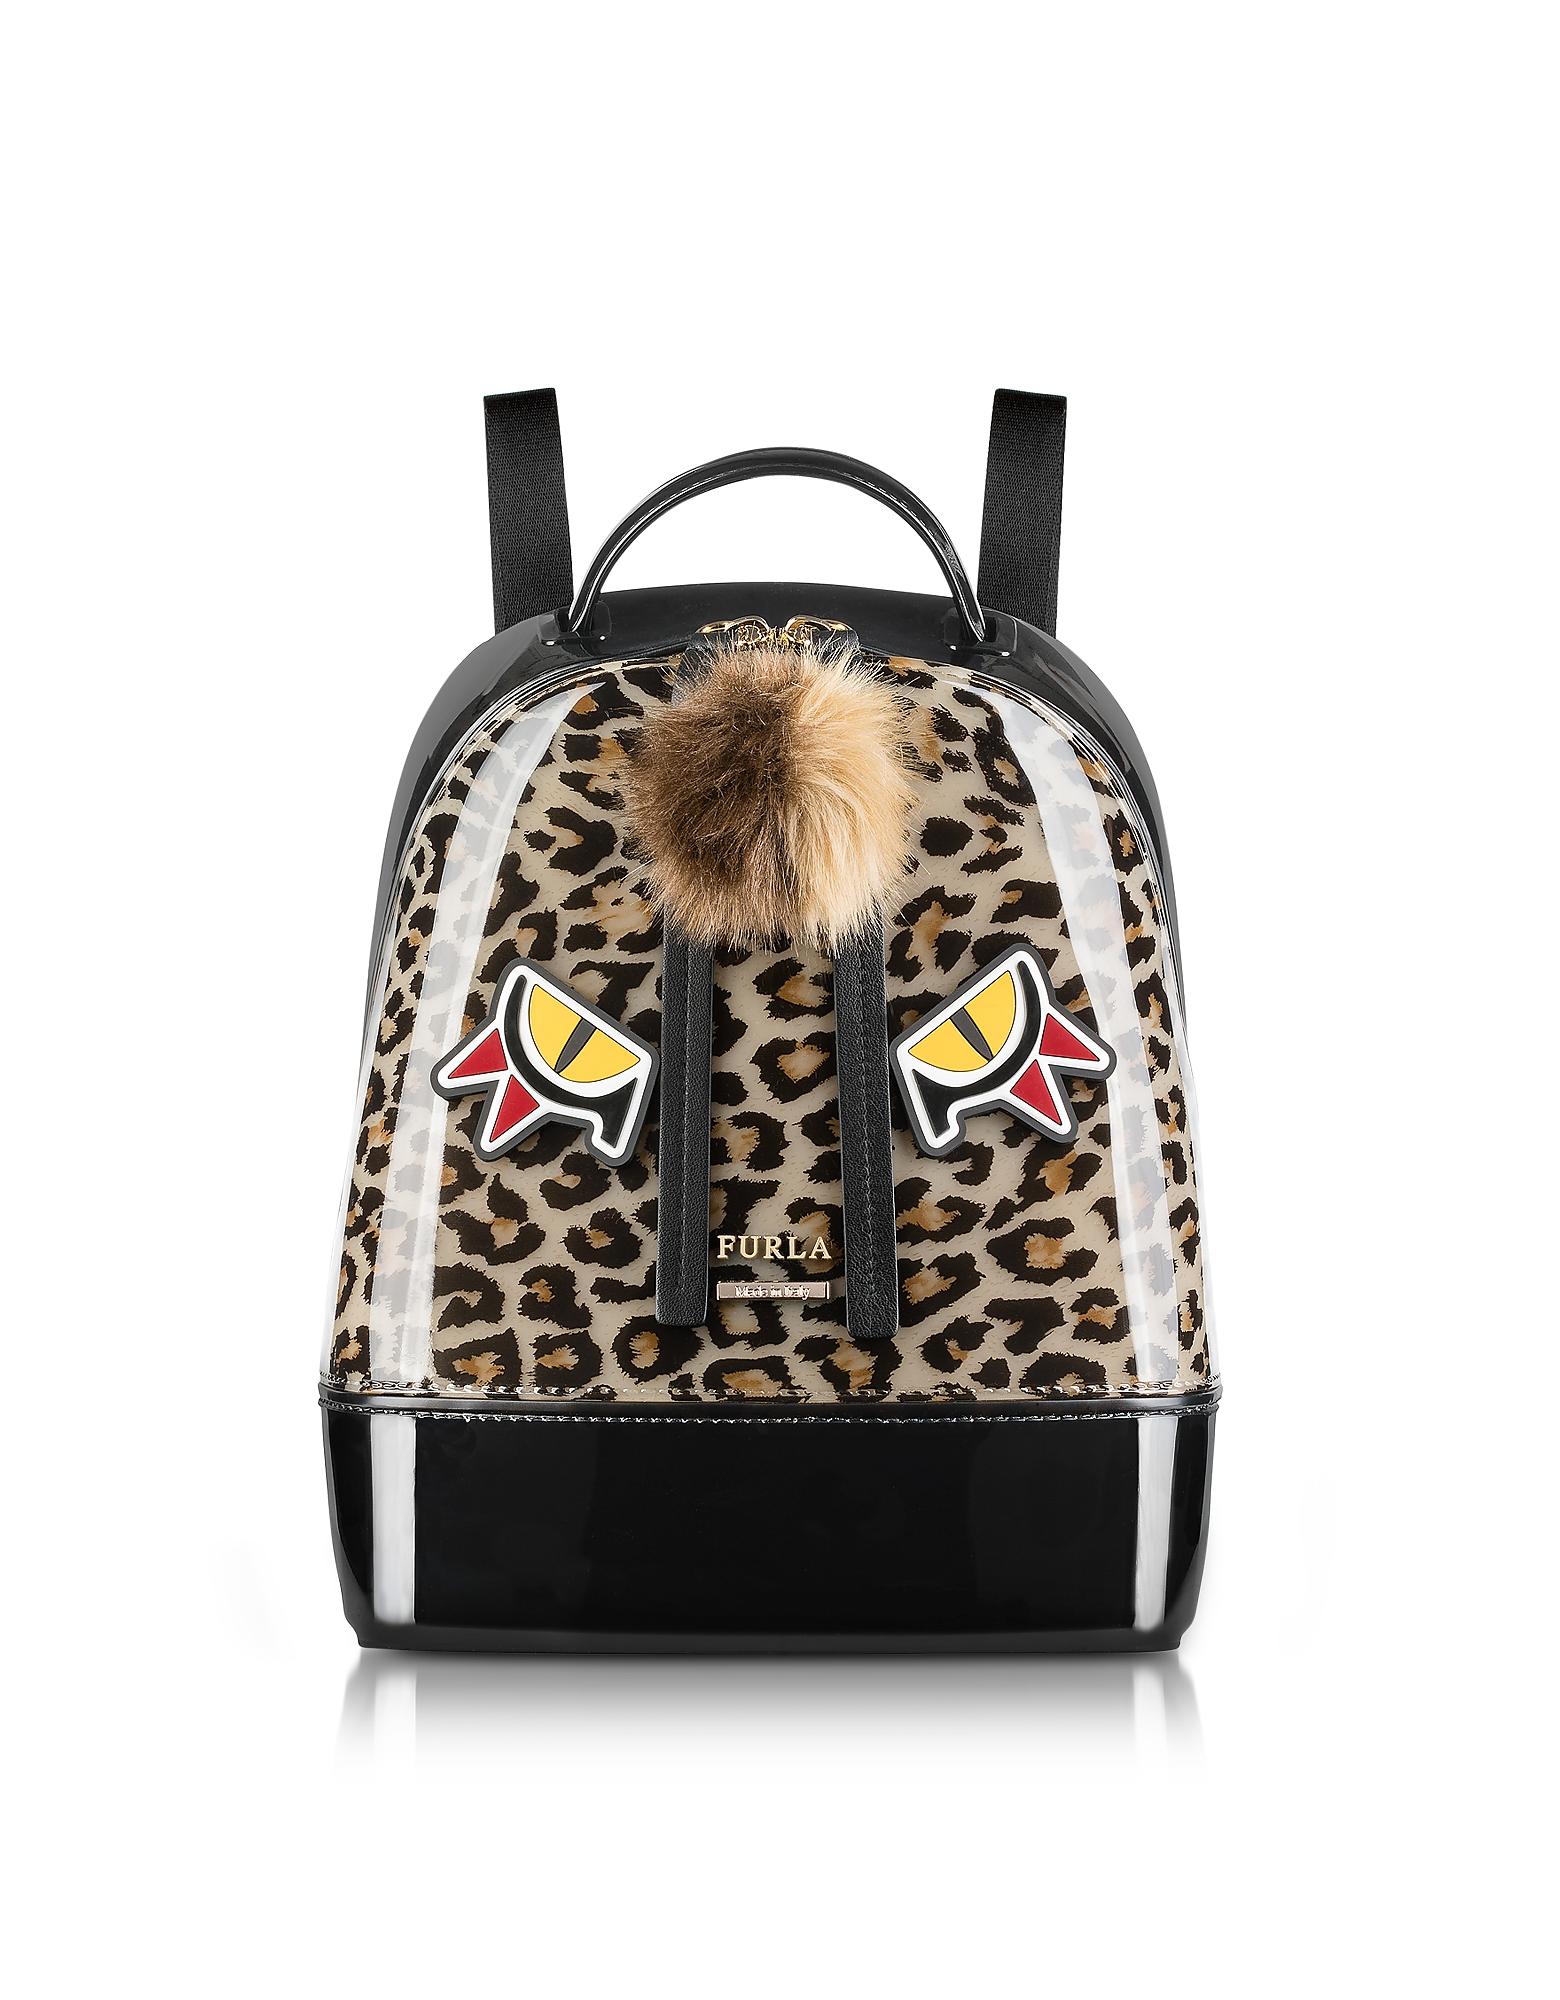 Furla Handbags, Leopard Print and Toni Glace Candy Jungle Small Backpack